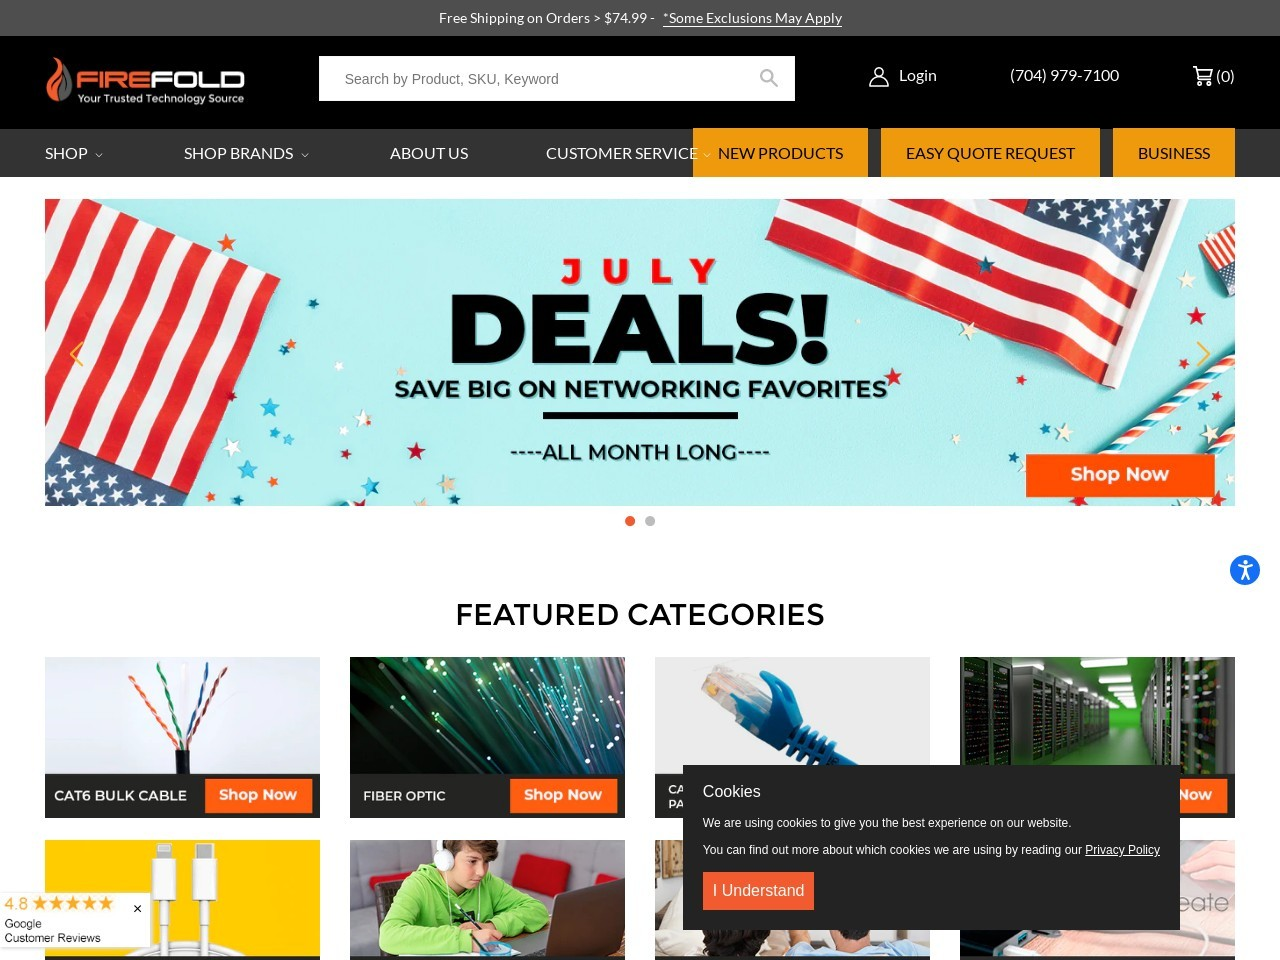 Firefold | Bulk Cables | Ethernet Cables